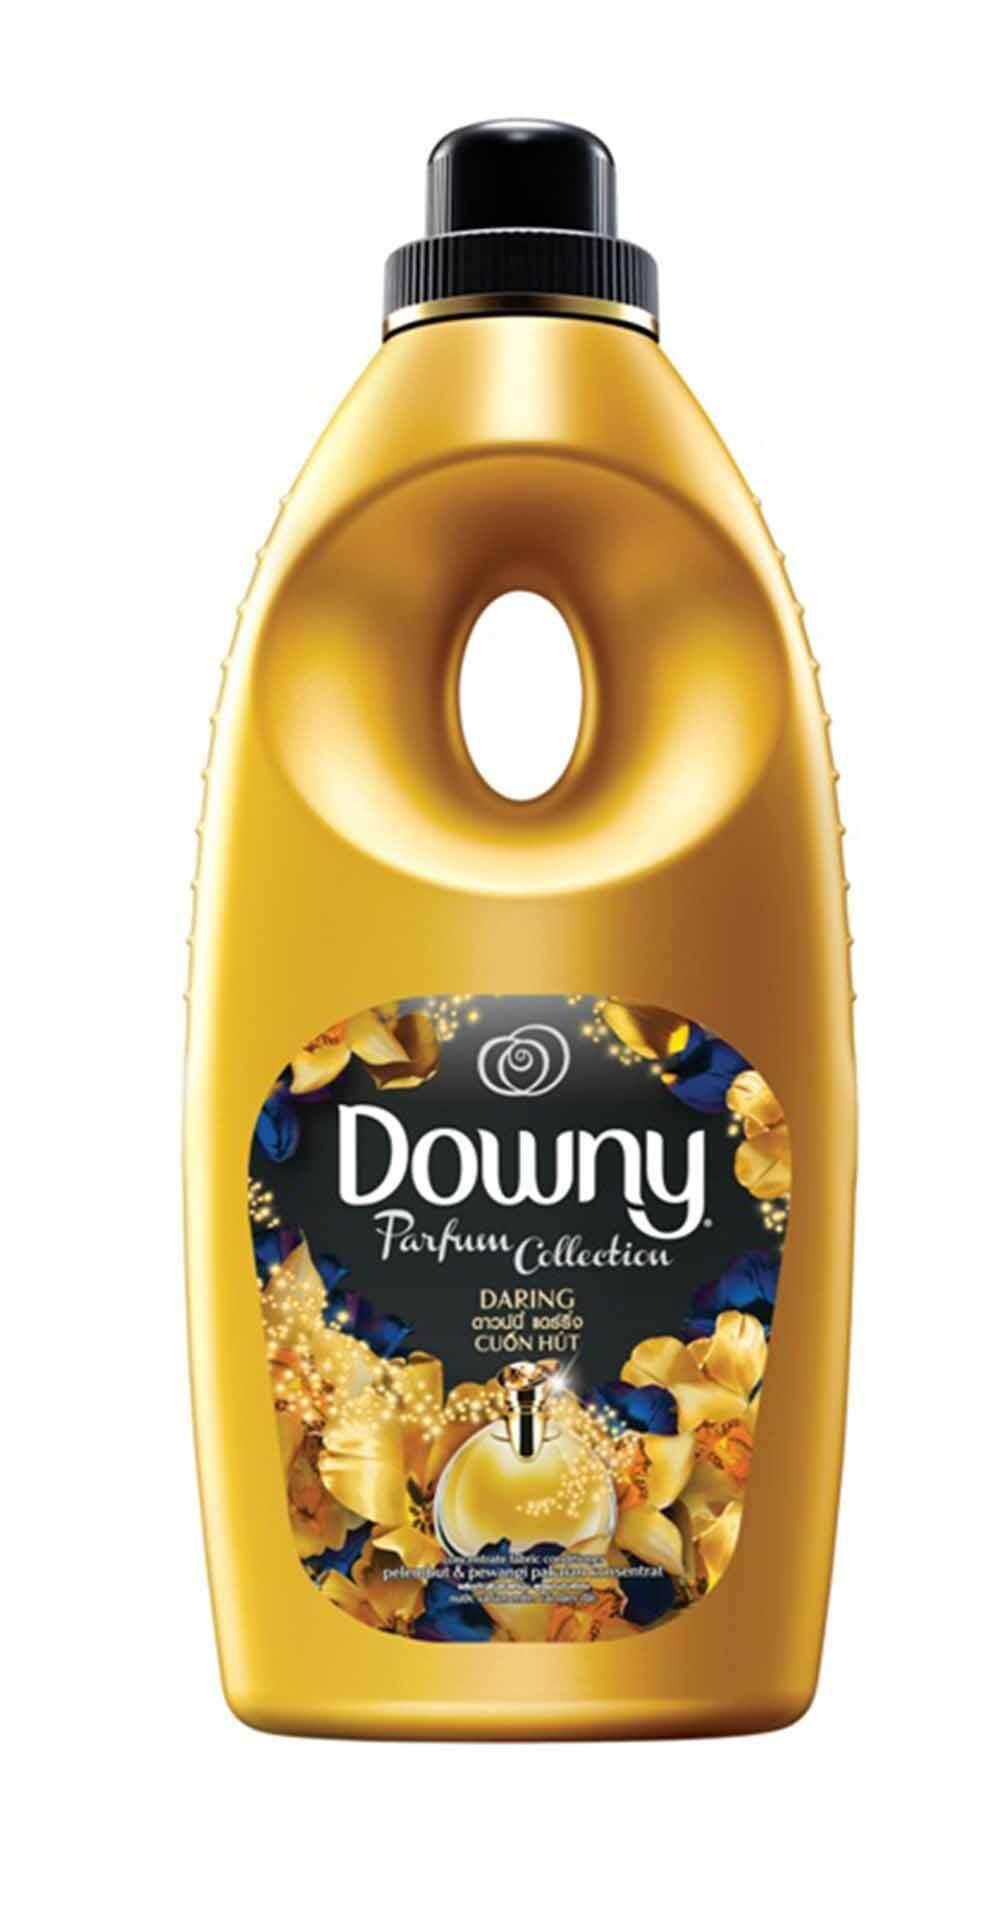 Downy Parfum Collection Timeless Refill 16l Bundle 2 Free Pewangi Pakaian Softener Daring 370ml Gold